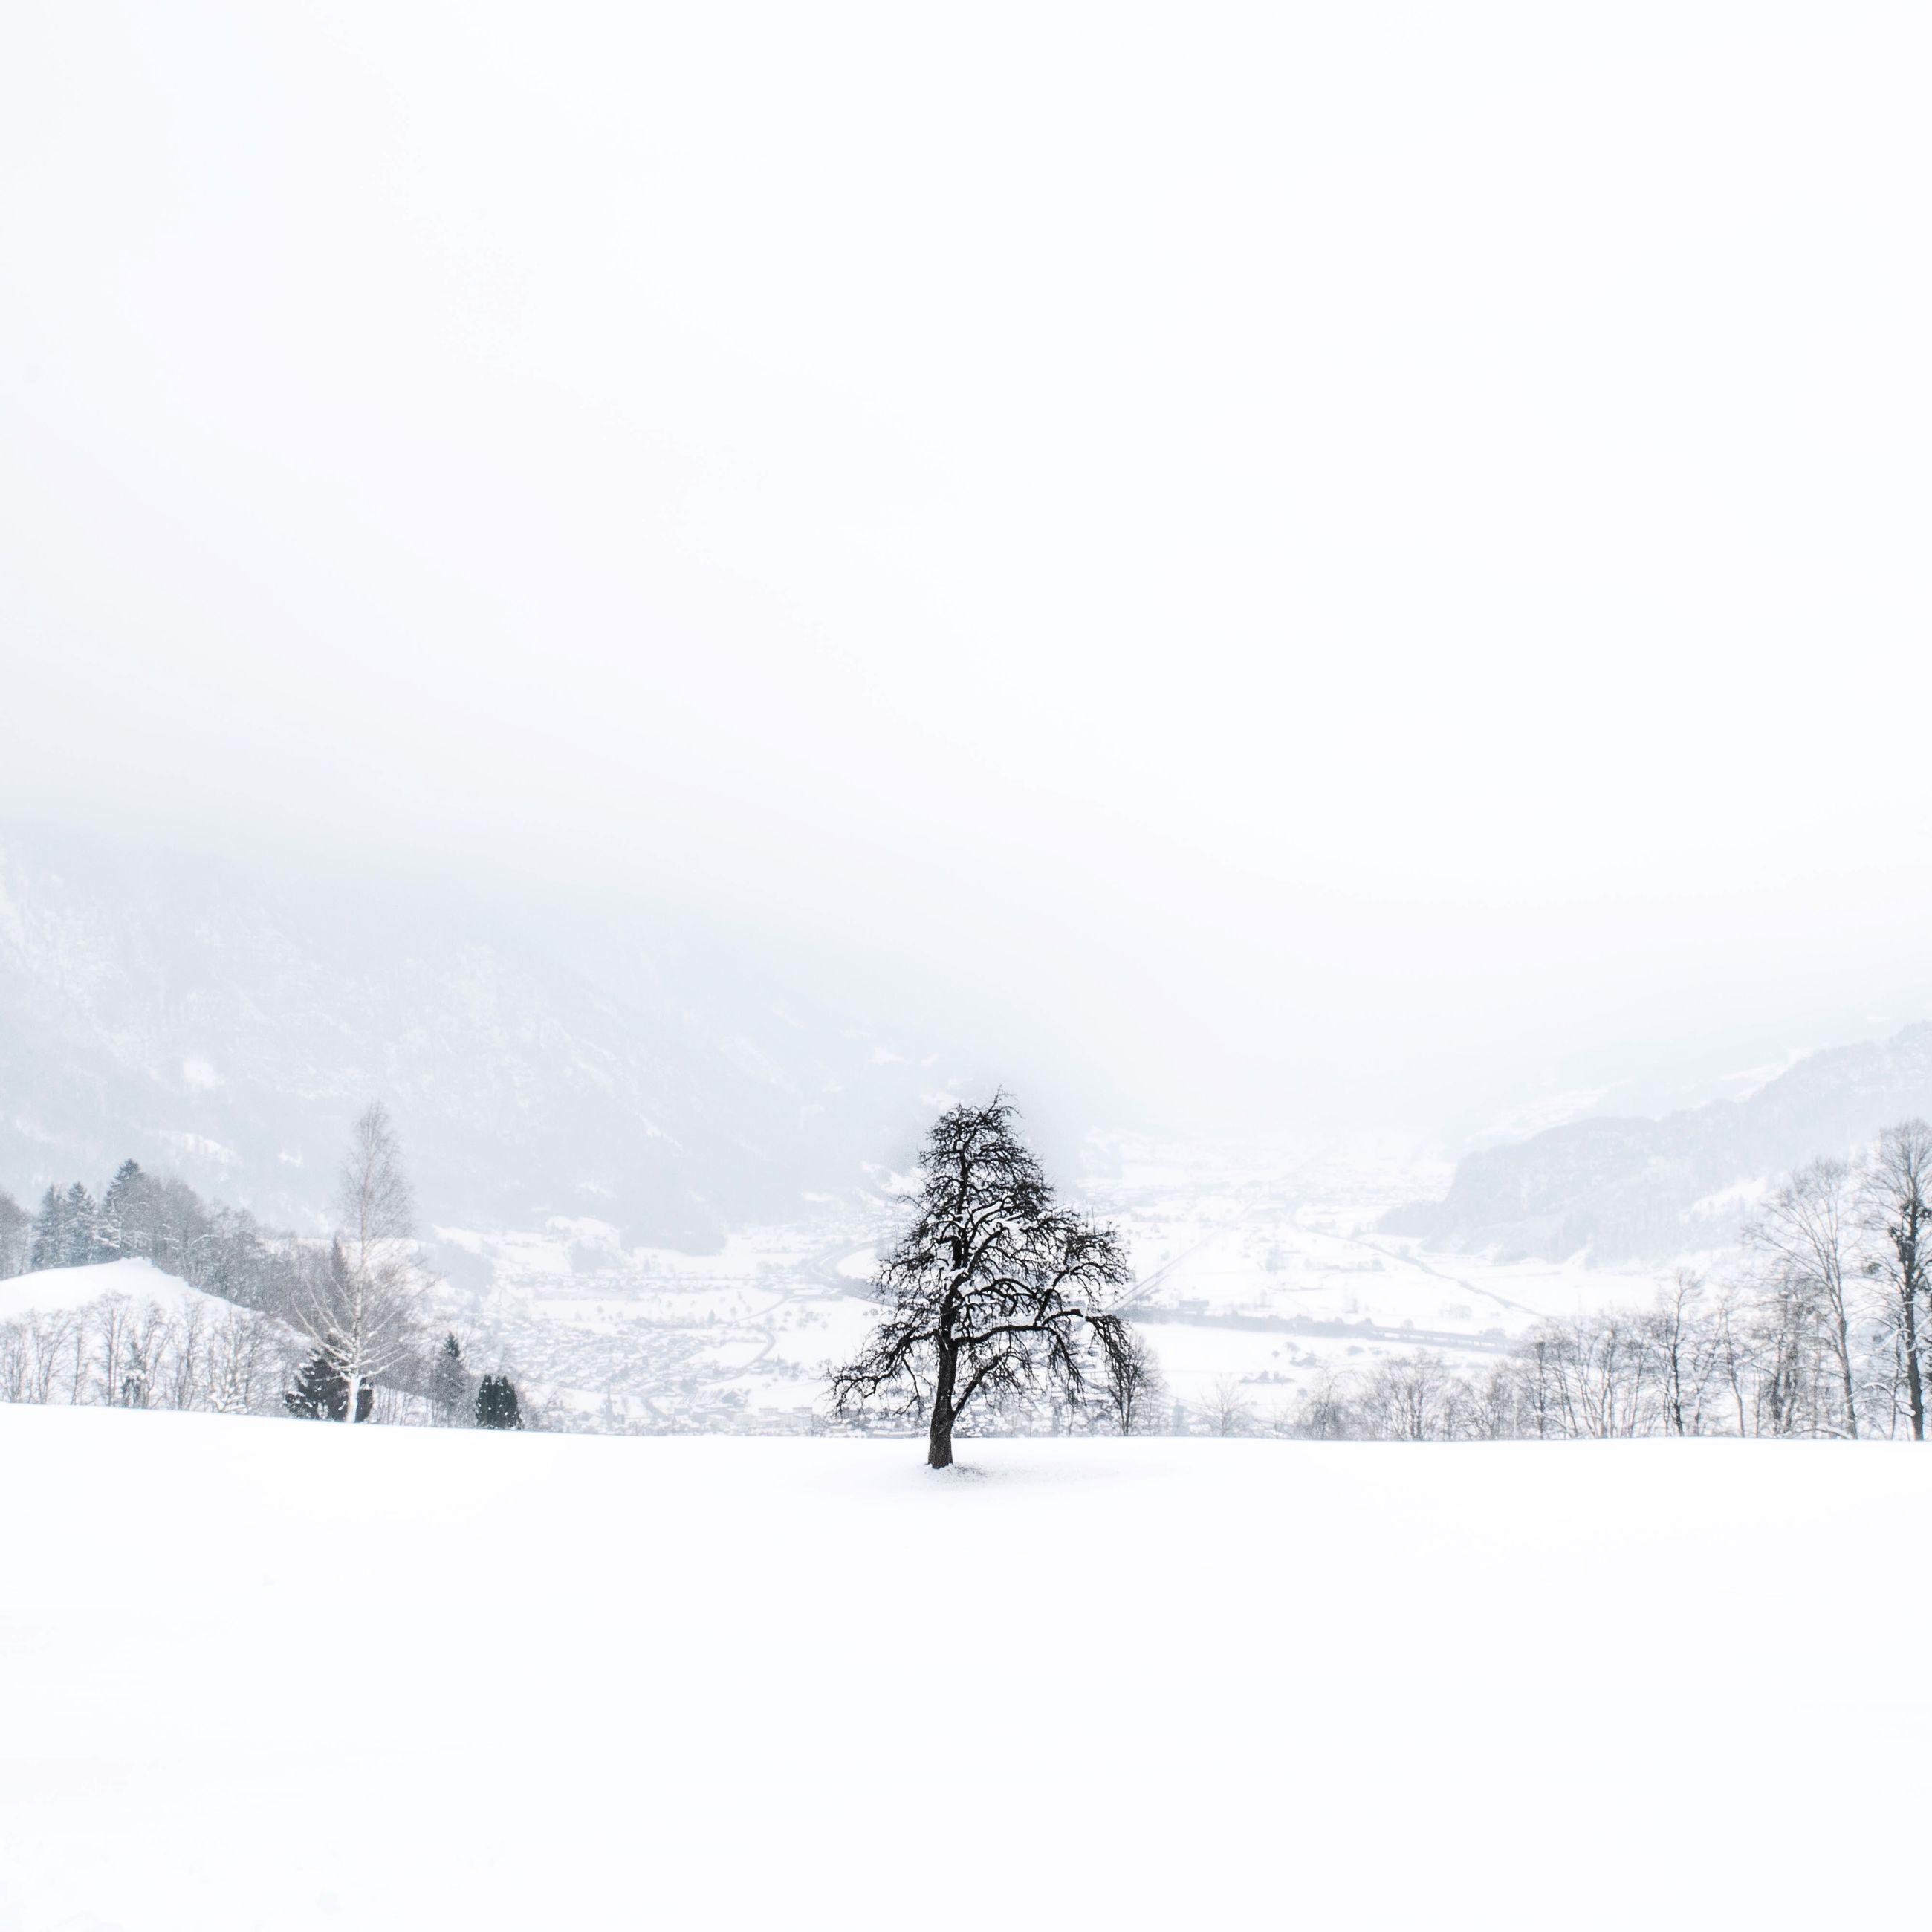 snow, winter, cold temperature, season, tranquil scene, weather, tranquility, scenics, landscape, beauty in nature, tree, mountain, nature, clear sky, covering, copy space, white color, non-urban scene, frozen, bare tree